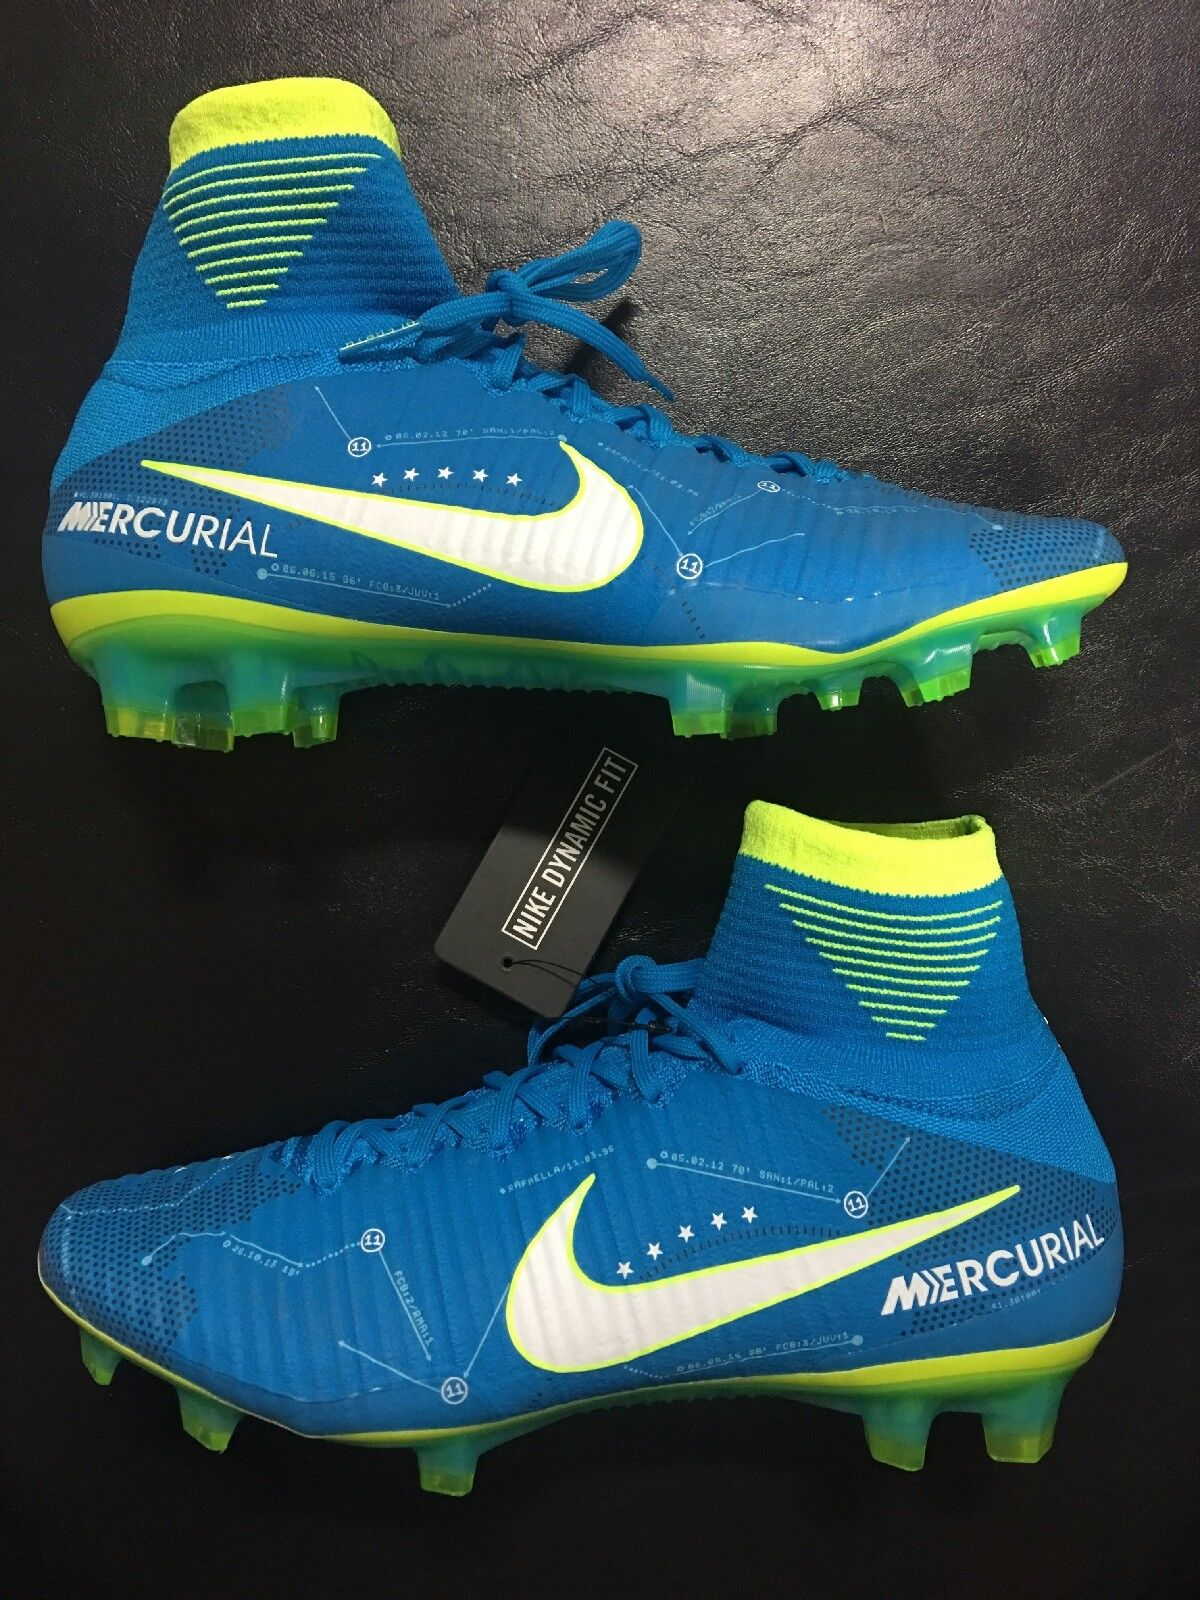 quality design 67151 f57f5 Nike Mercurial Superfly V NJR FG Soccer Cleat Blue Orbit (921499-400)  Neymar Jr 8